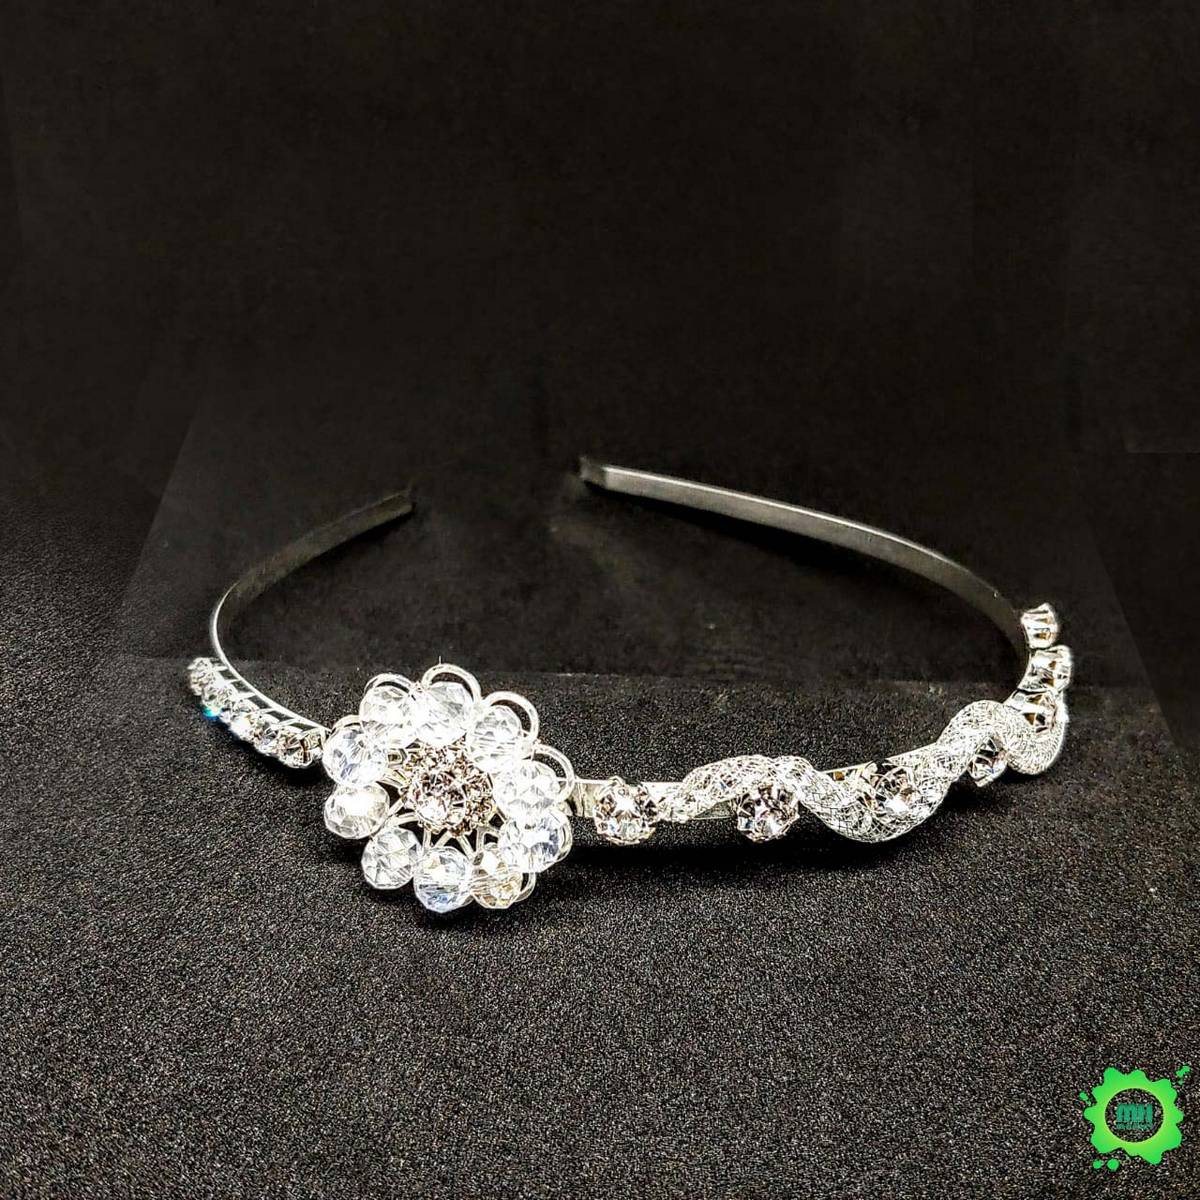 Gold Plated Metal Rhinestone Bride Headband Hairband Bridal Hair Jewelry Head Piece Wedding Crown Accessories mhfashion